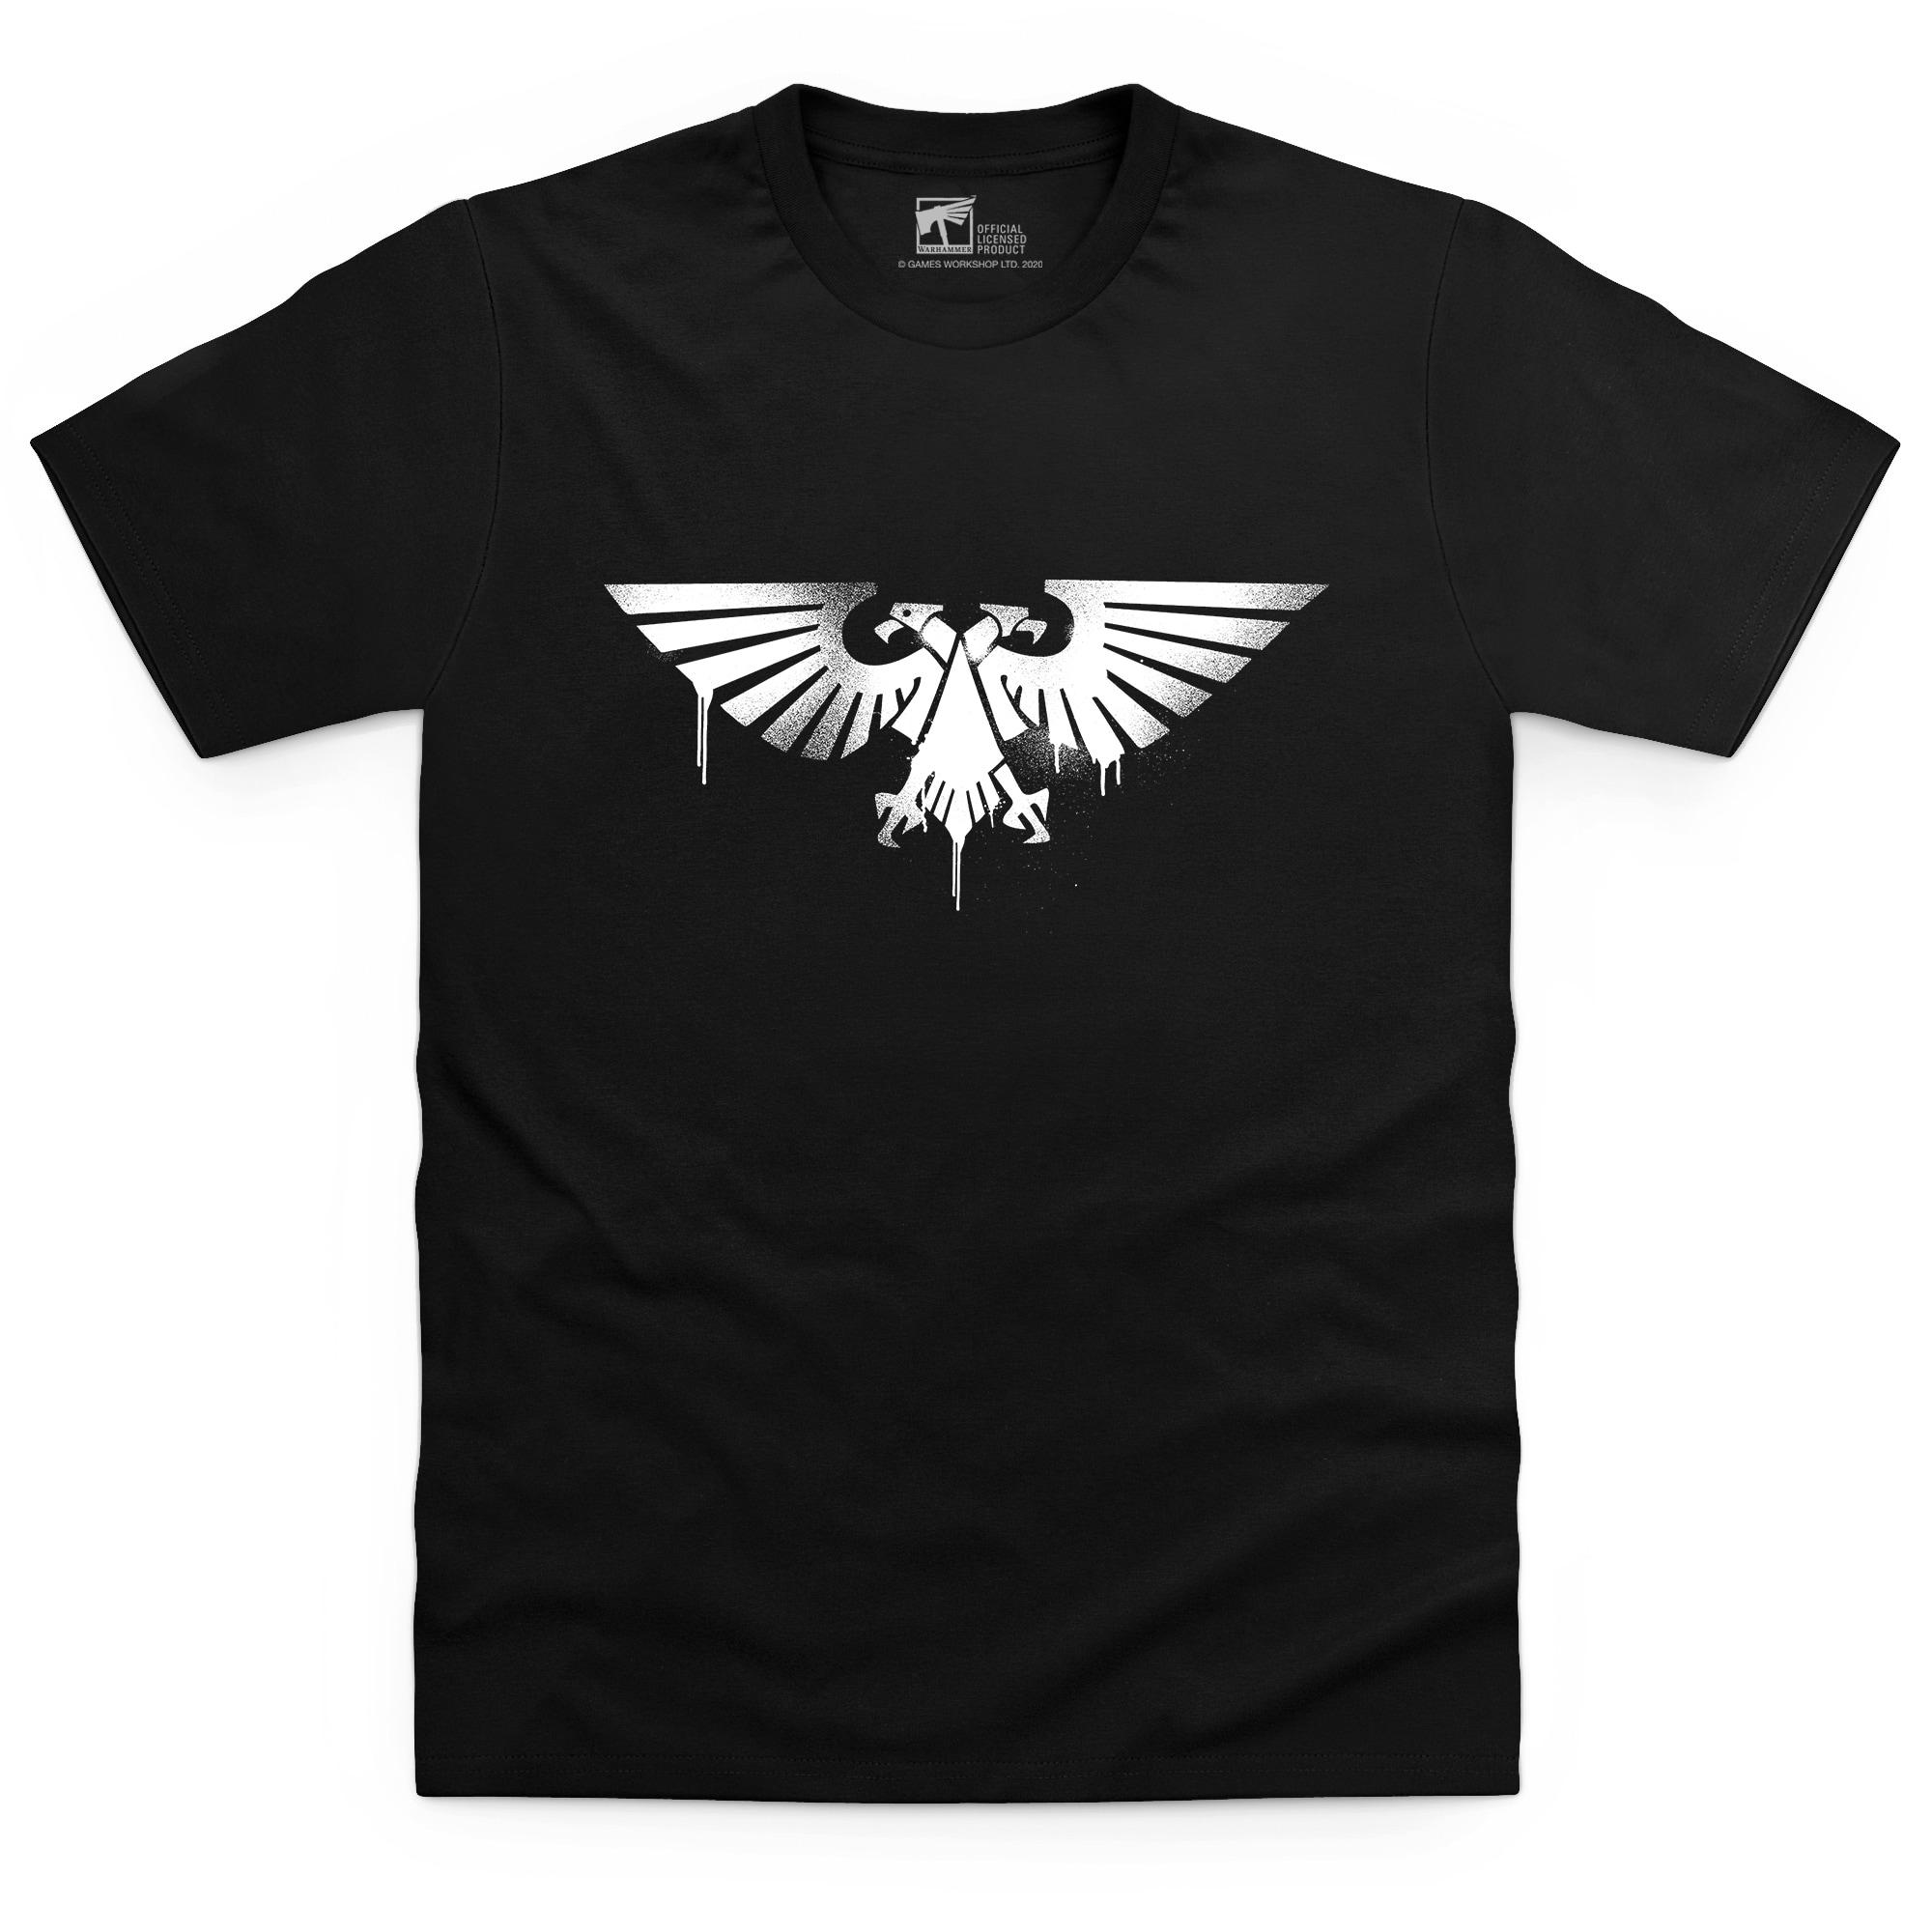 Product Image of Customisable 'Graffiti style' Insignia T Shirt